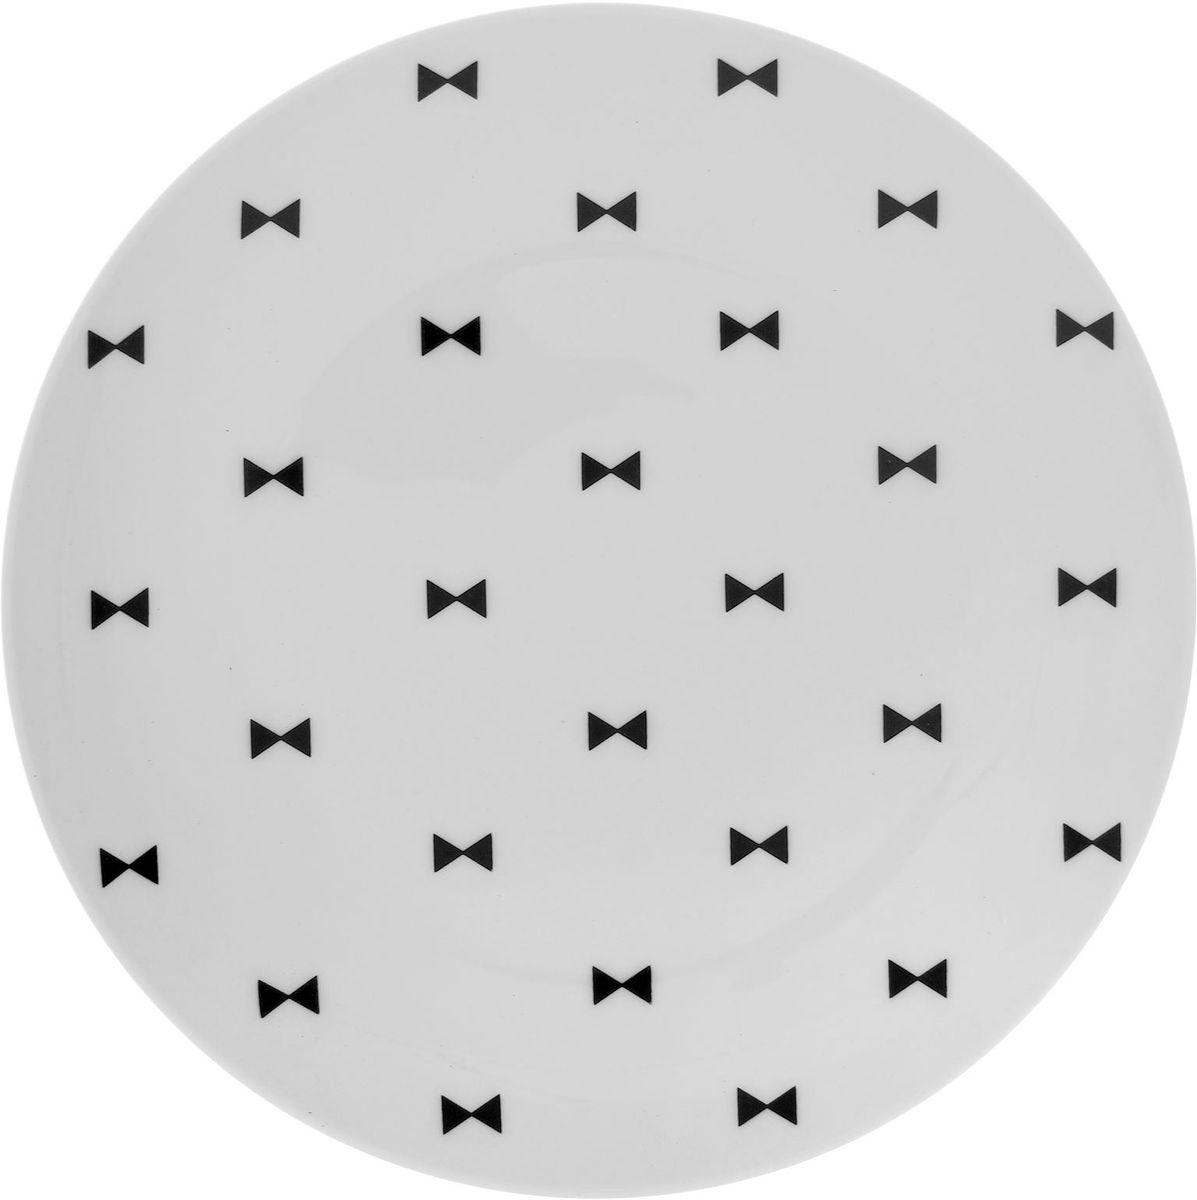 Тарелка мелкая Сотвори чудо Бантик Sans Brides, диаметр 20 см. 1563641 тарелка мелкая сотвори чудо полярный мишка диаметр 20 см